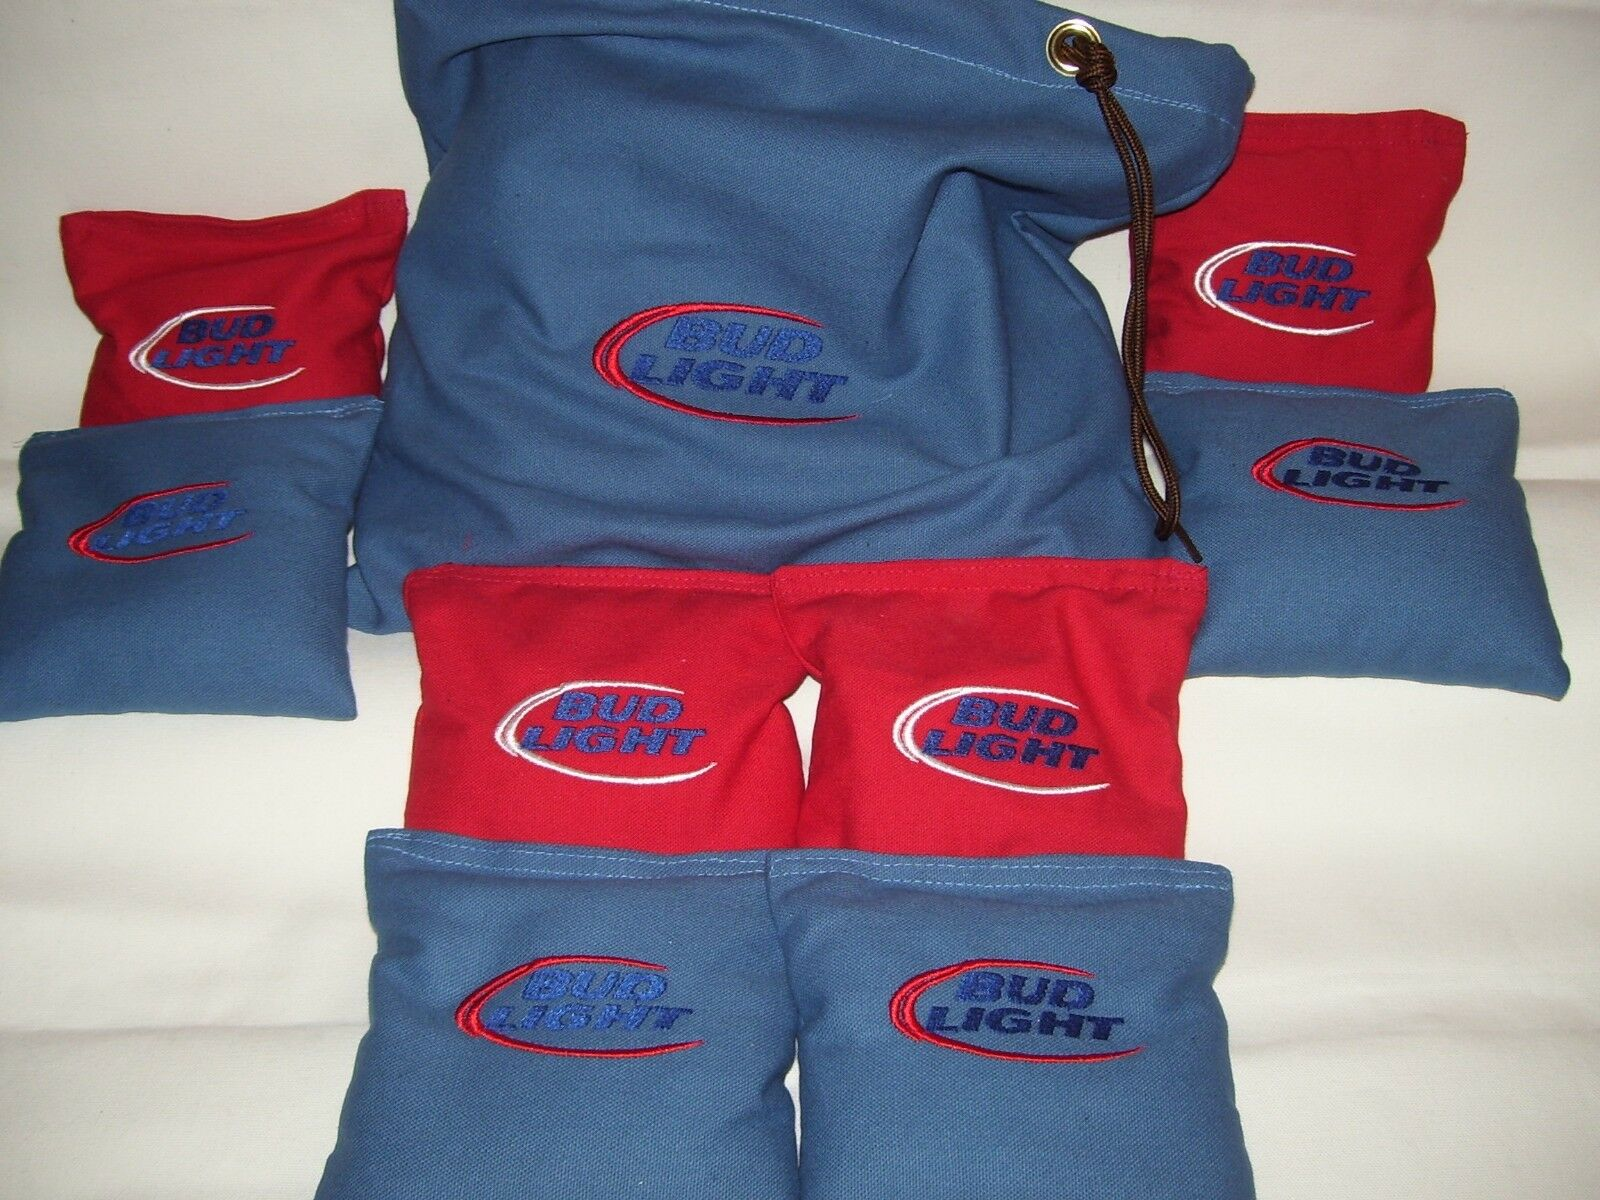 Bud Light Embroidered Cornhole set of 8 Corn Hole Bags With Storage Bag